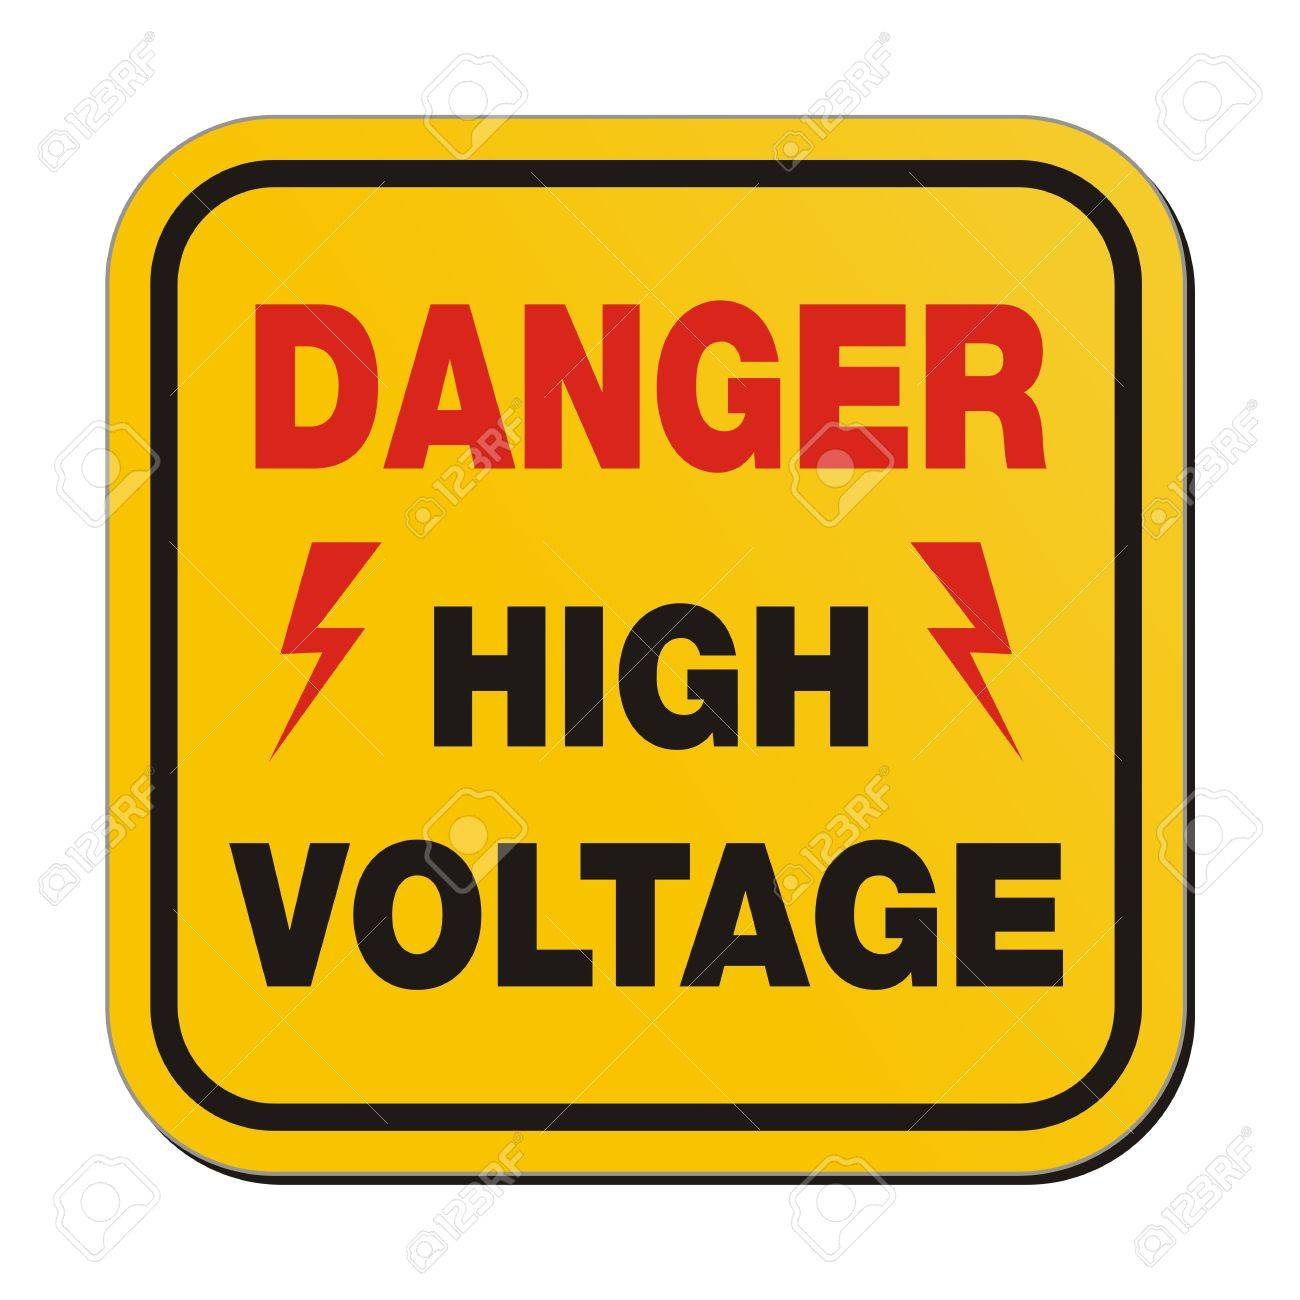 danger high voltage - yellow sign Stock Vector - 20823348